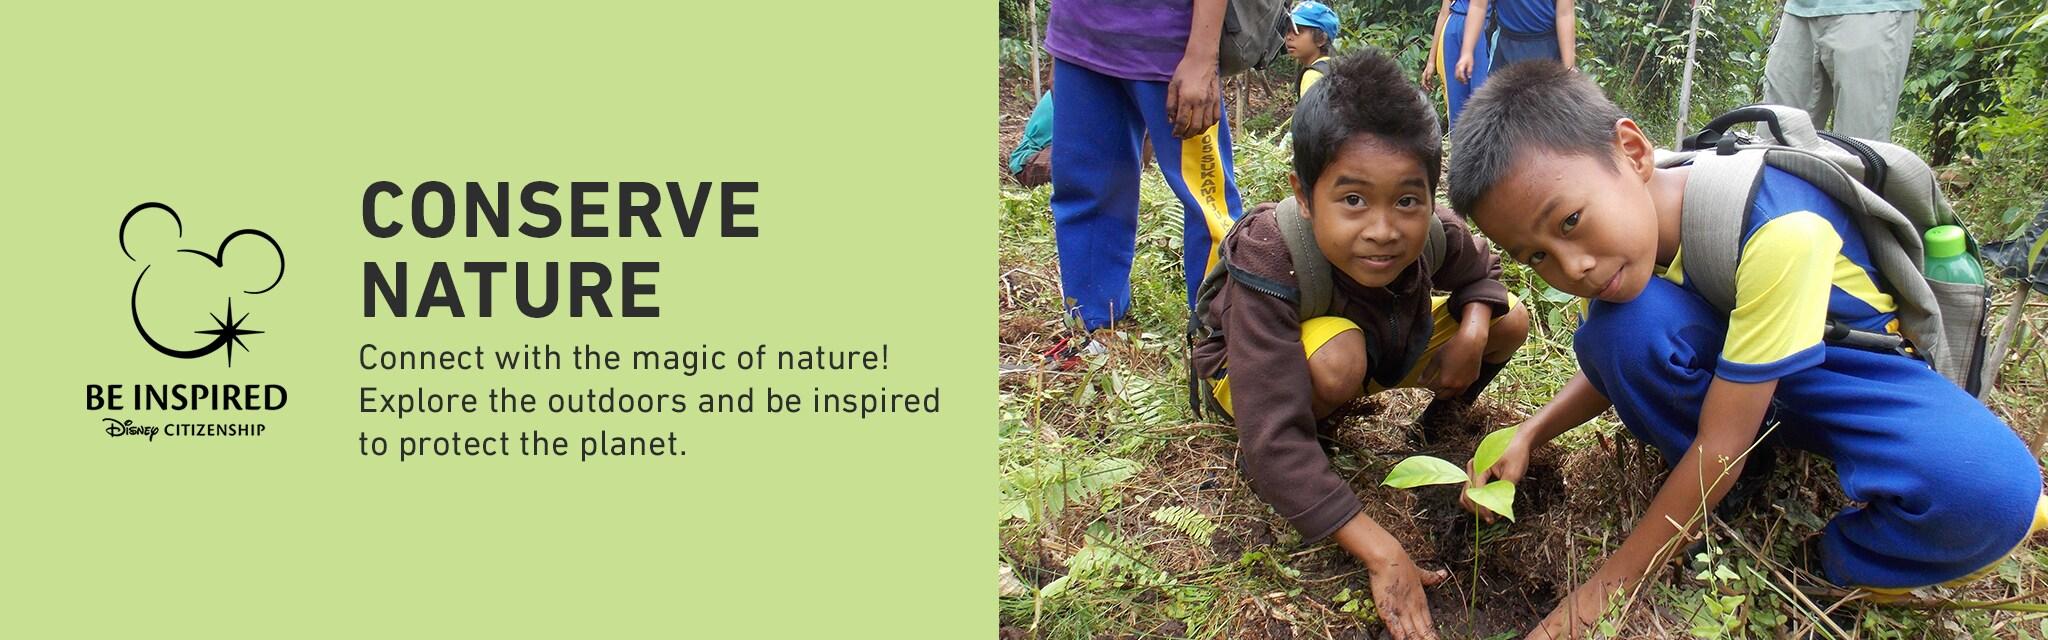 Conserve Nature Hero